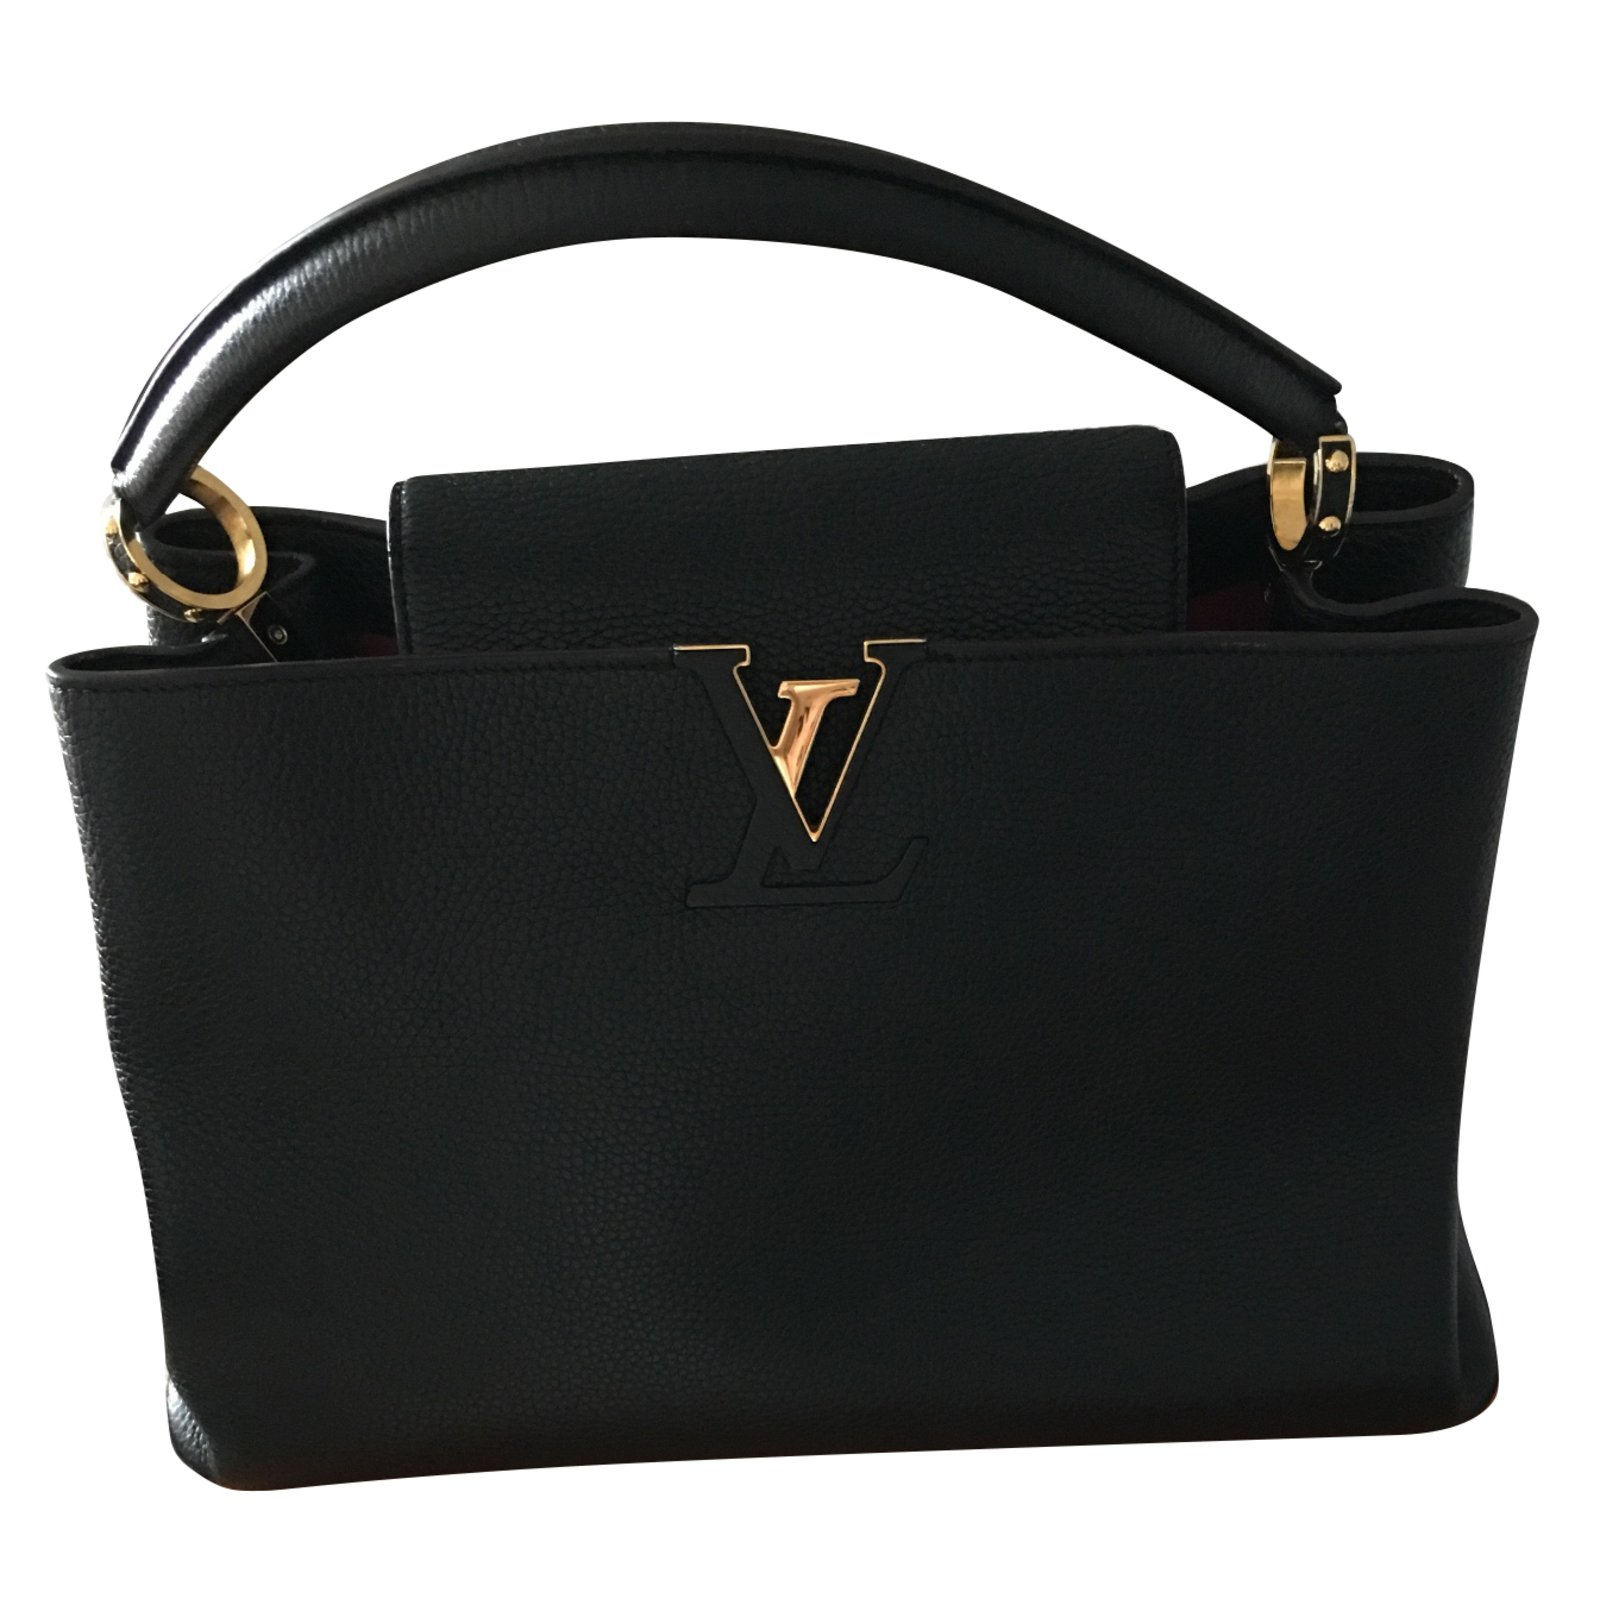 9f54a9d11223c7 Louis Vuitton Capucine Handbags Leather Black ref.60626 - Joli Closet